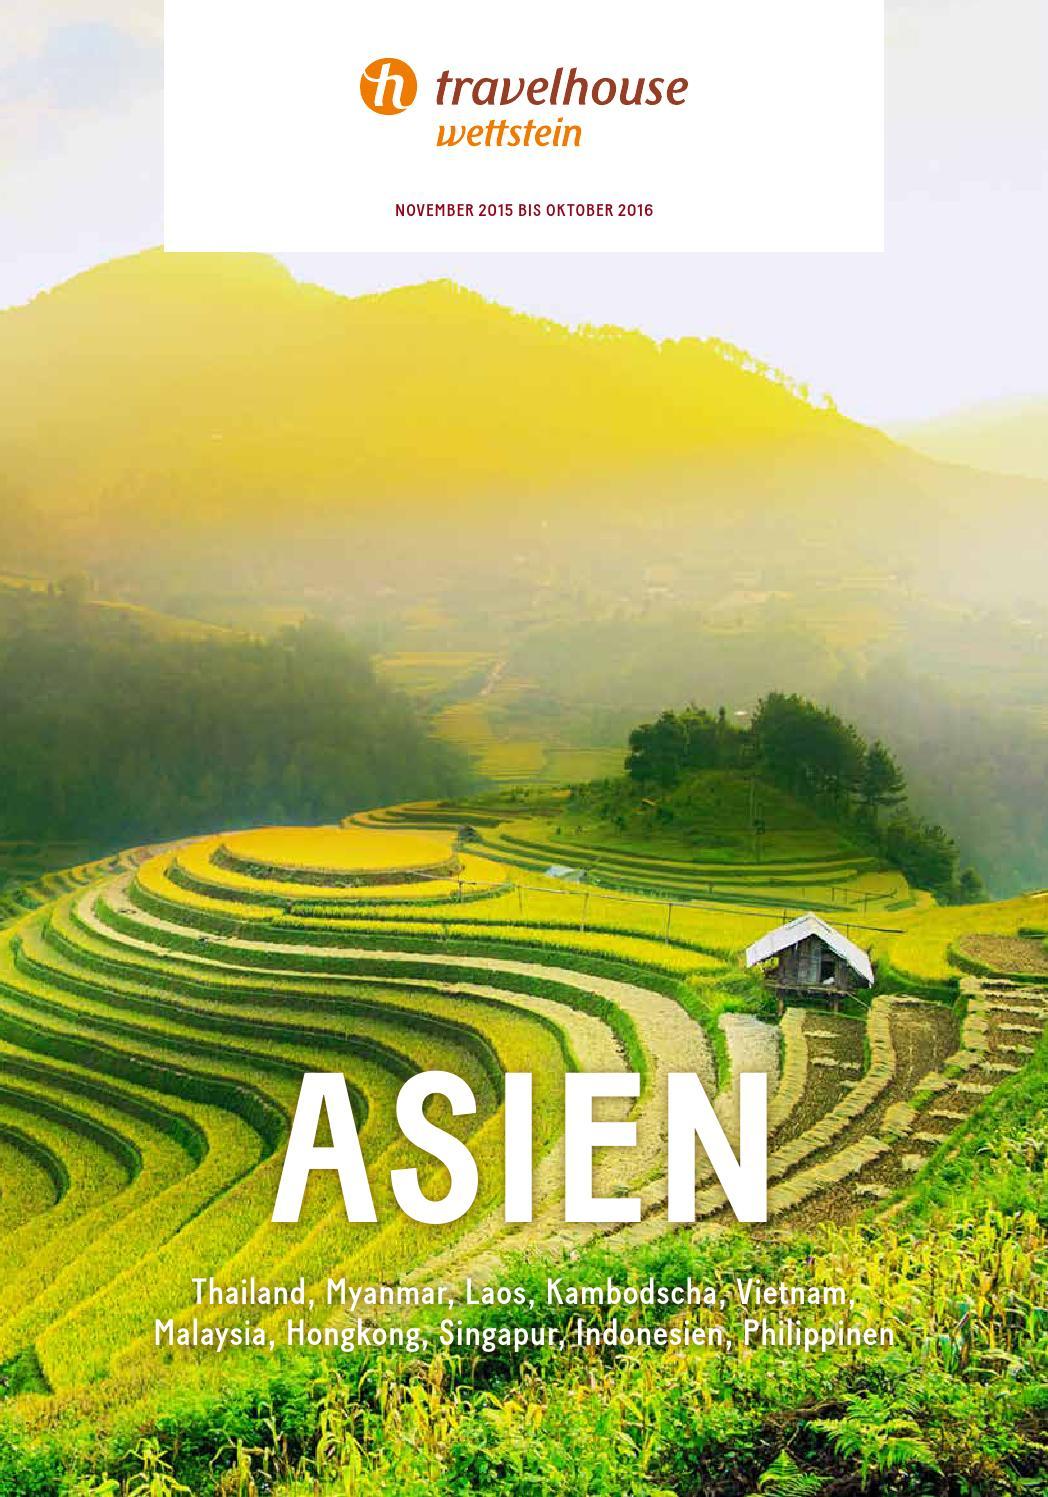 Travelhouse Asien - November 2015 bis Oktober 2016 by Hotelplan ...